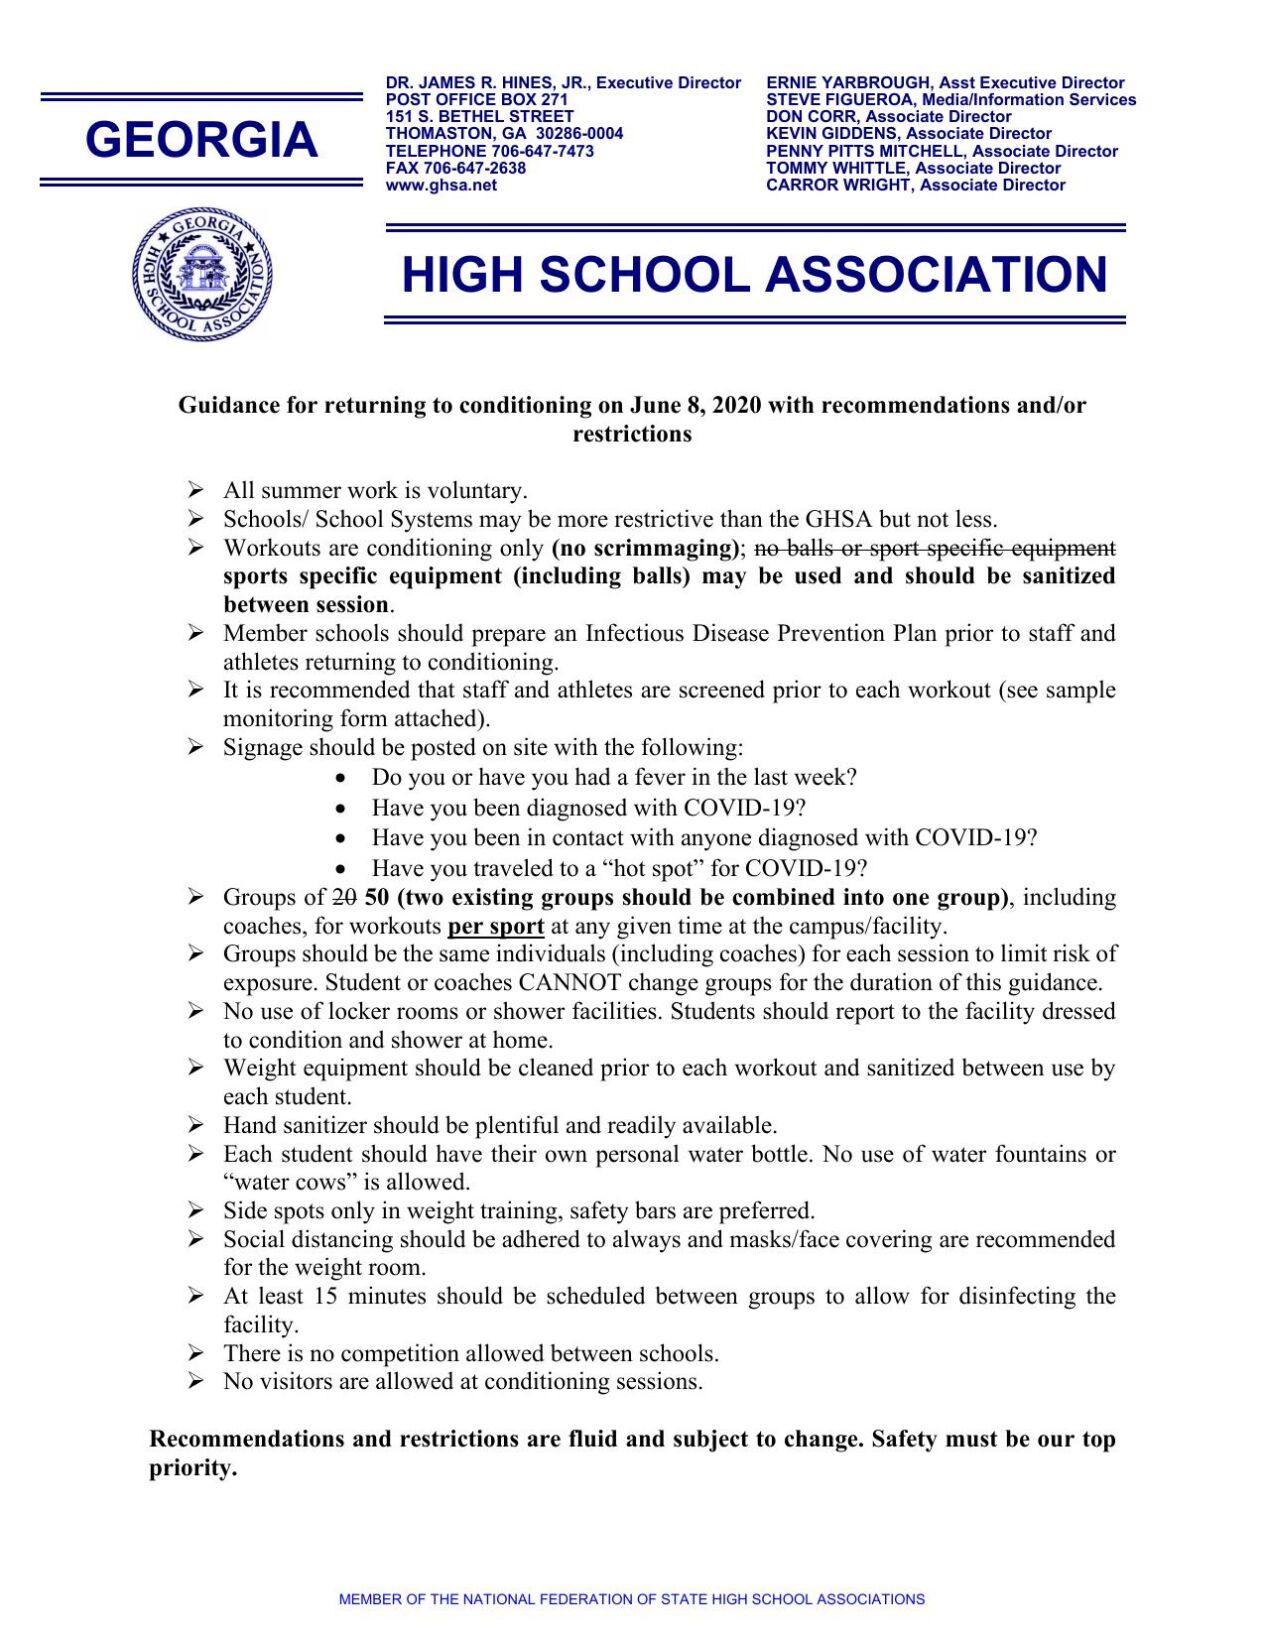 GHSA Guidance